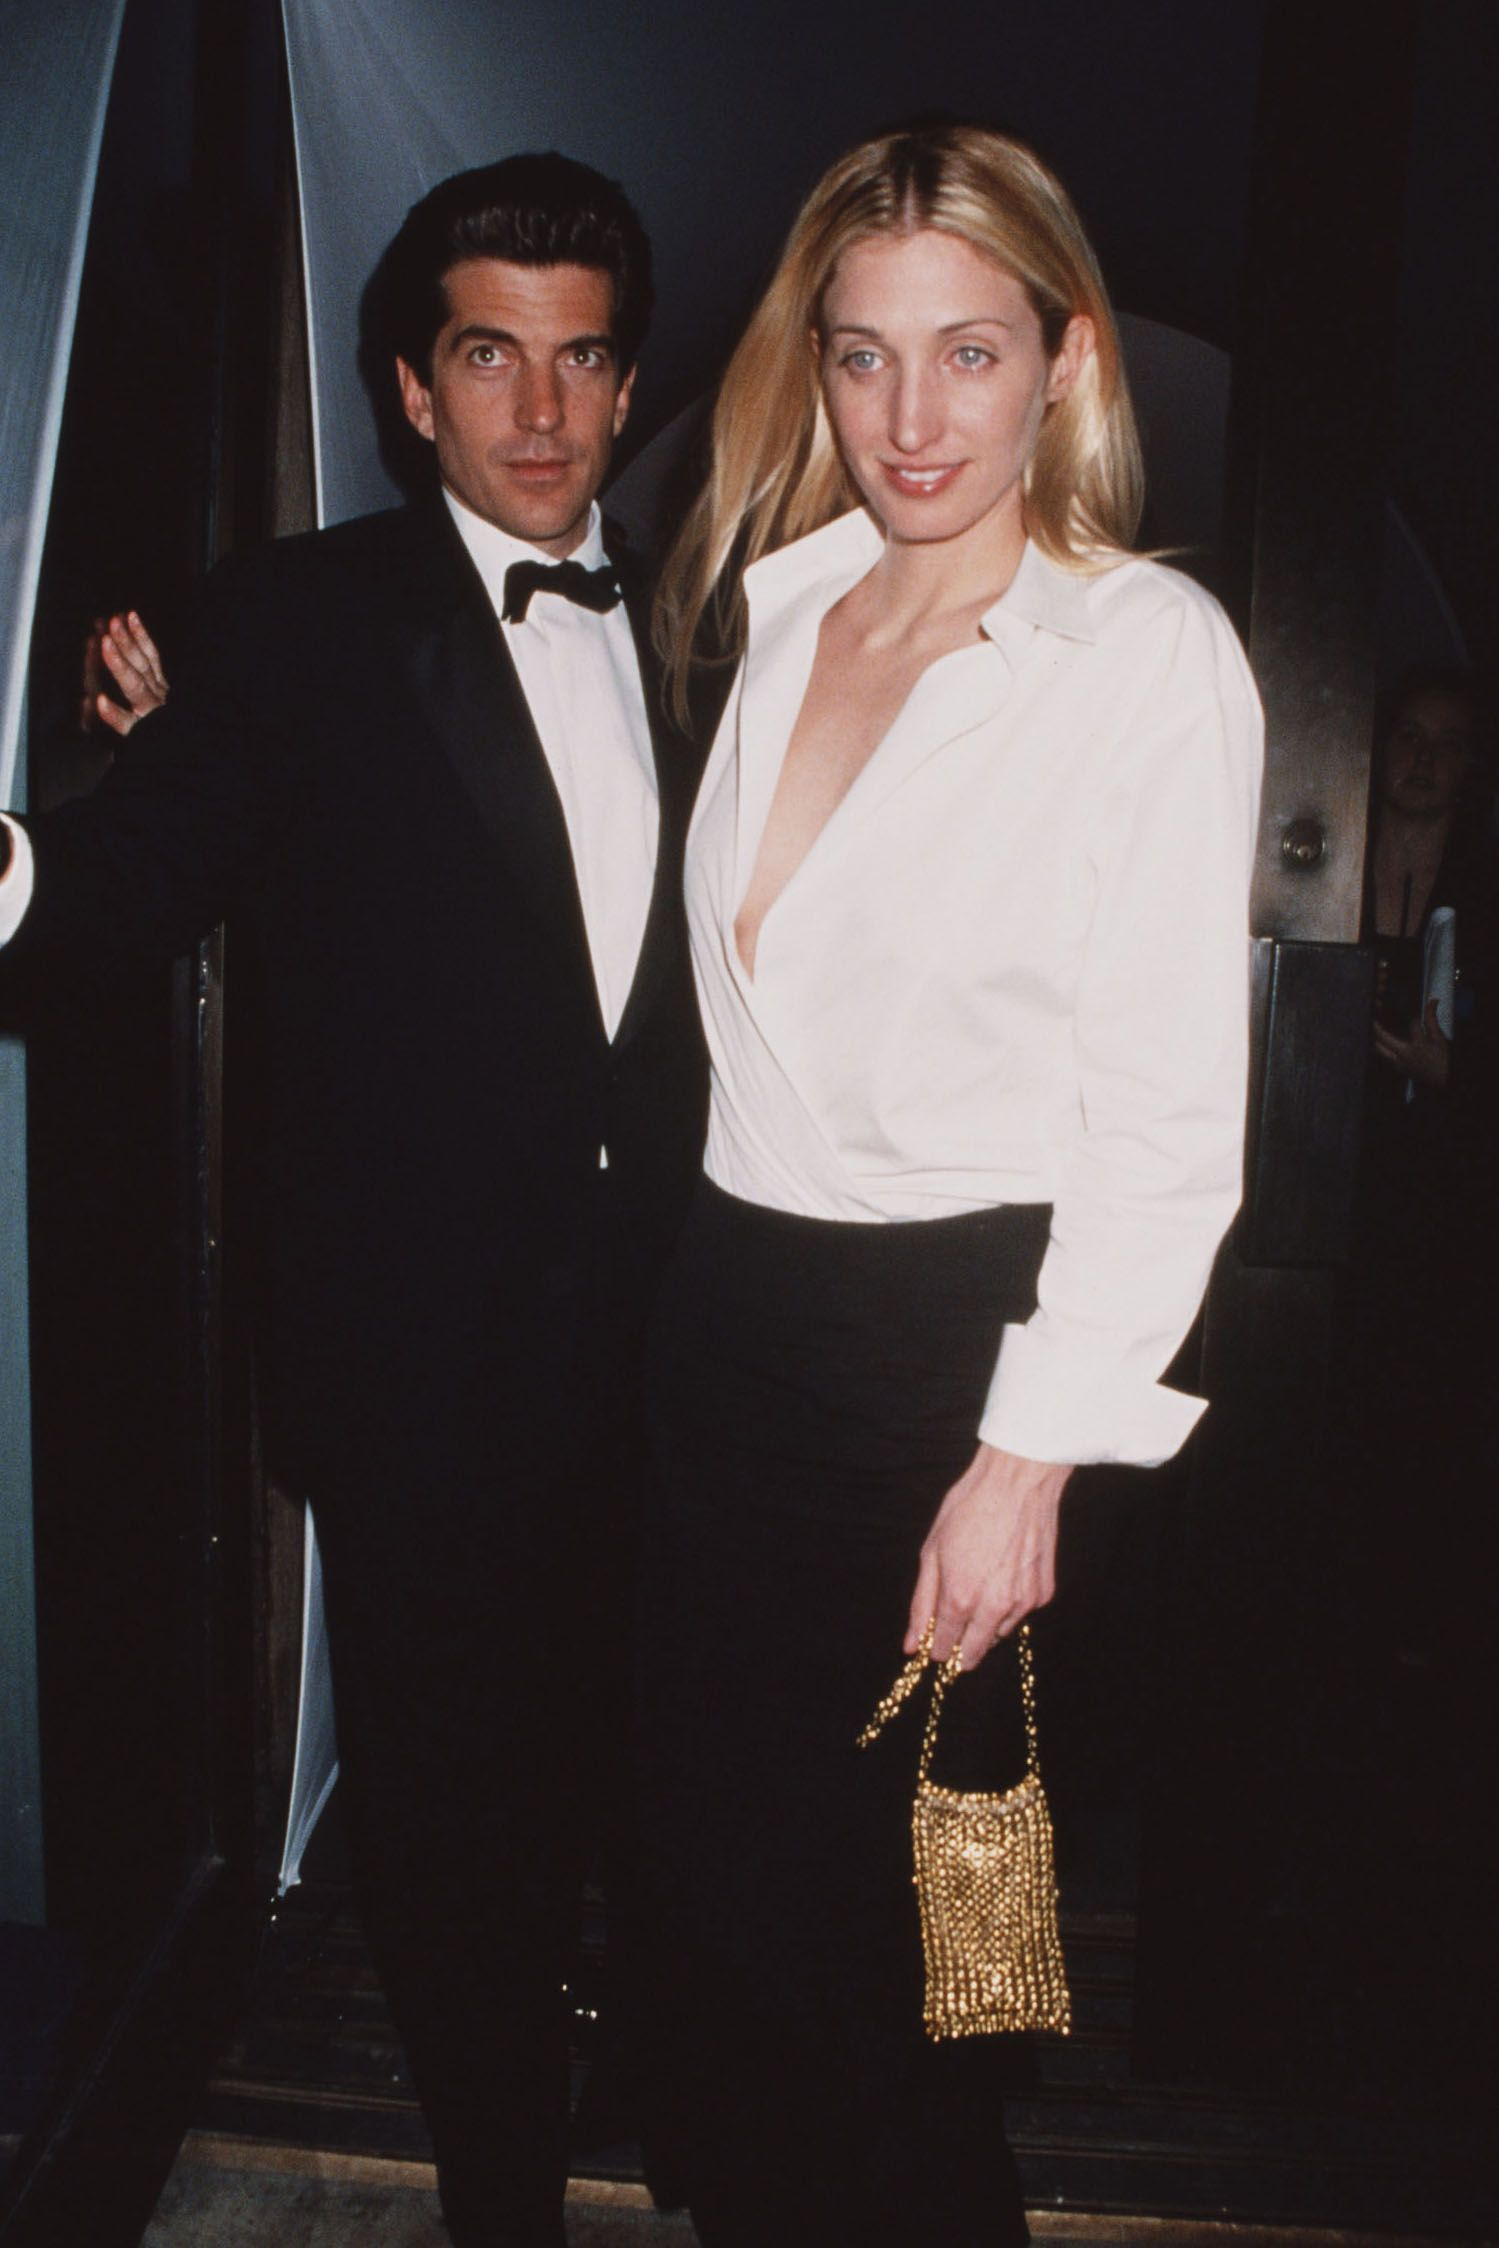 John F. Kennedy Jr. with his wife, Carolyn Bessette-Kennedy, in 1995.